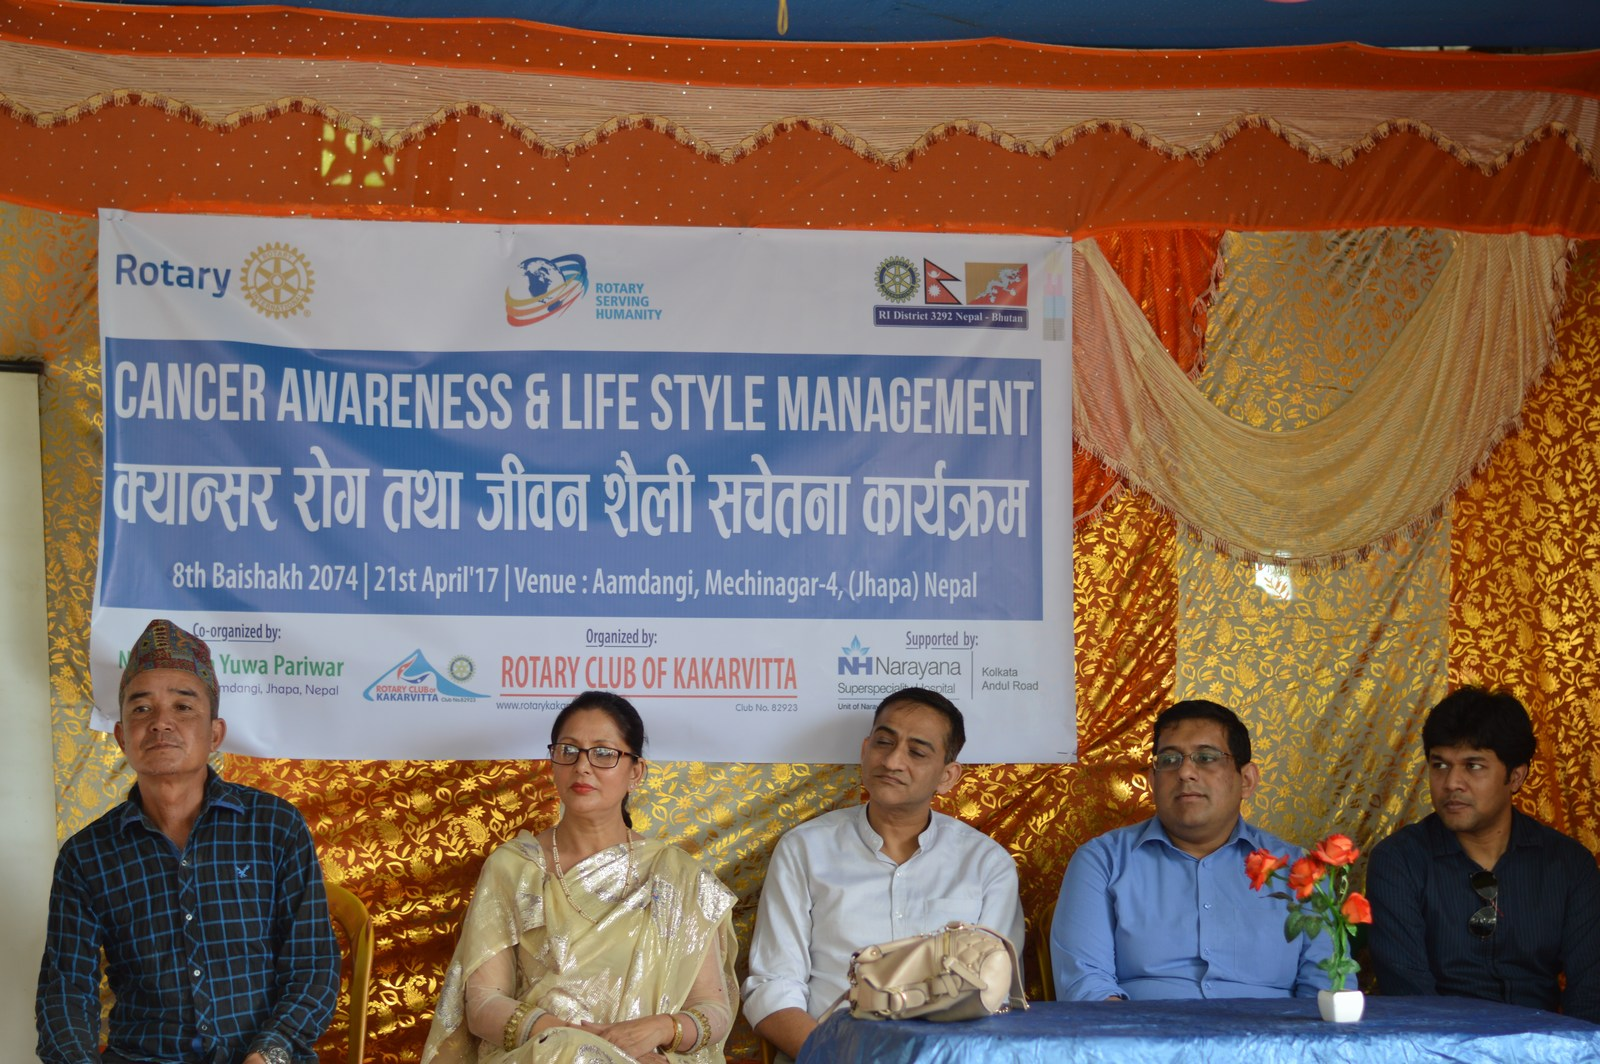 Cancer-Awareness-Life-Style-Management-Interaction-Program-2016-17-Rotary-Club-of-Kakarvitta-5